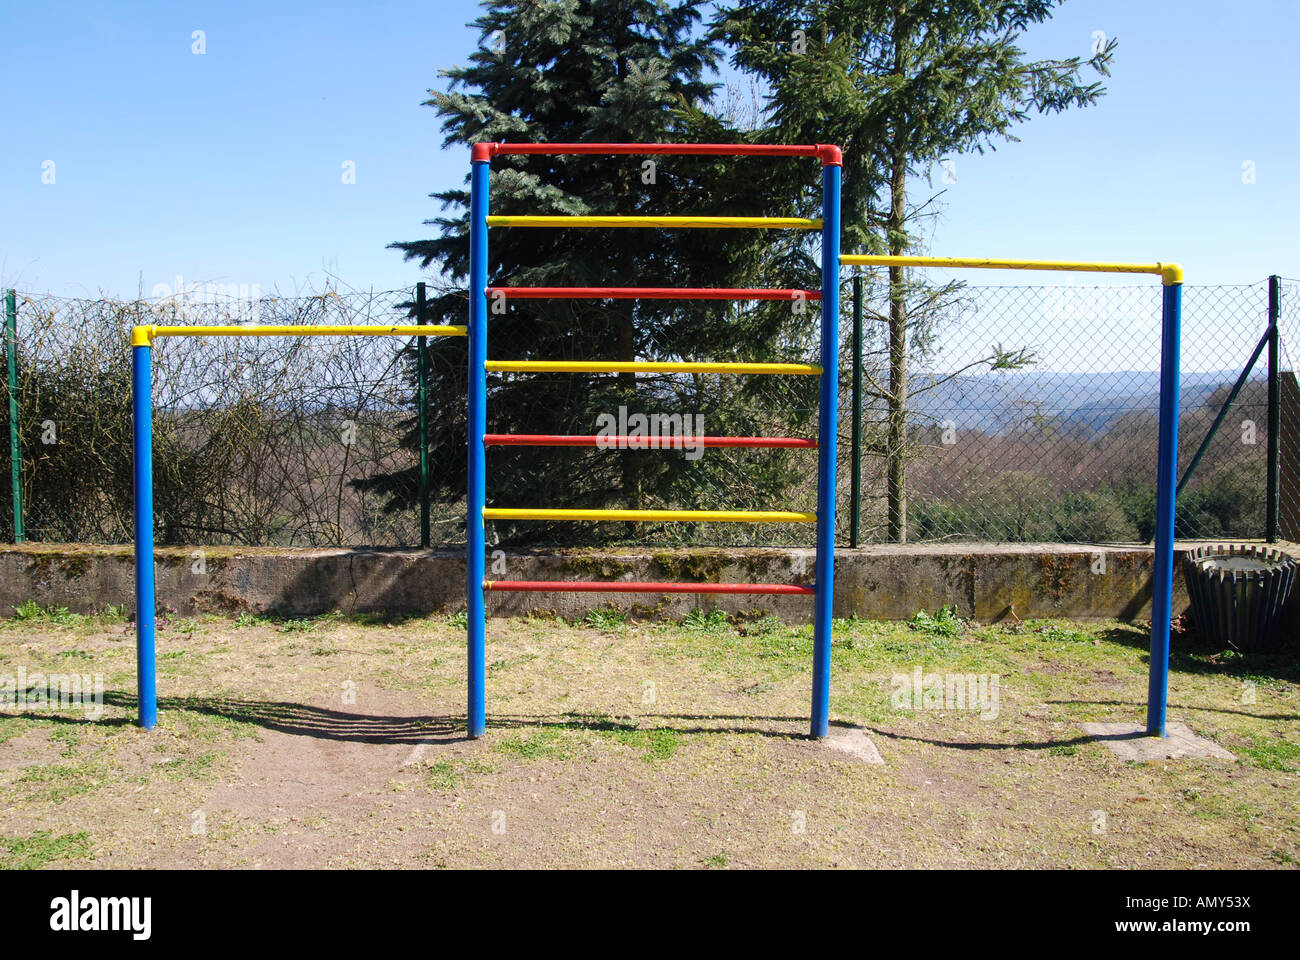 Monkey bars in park - Stock Image